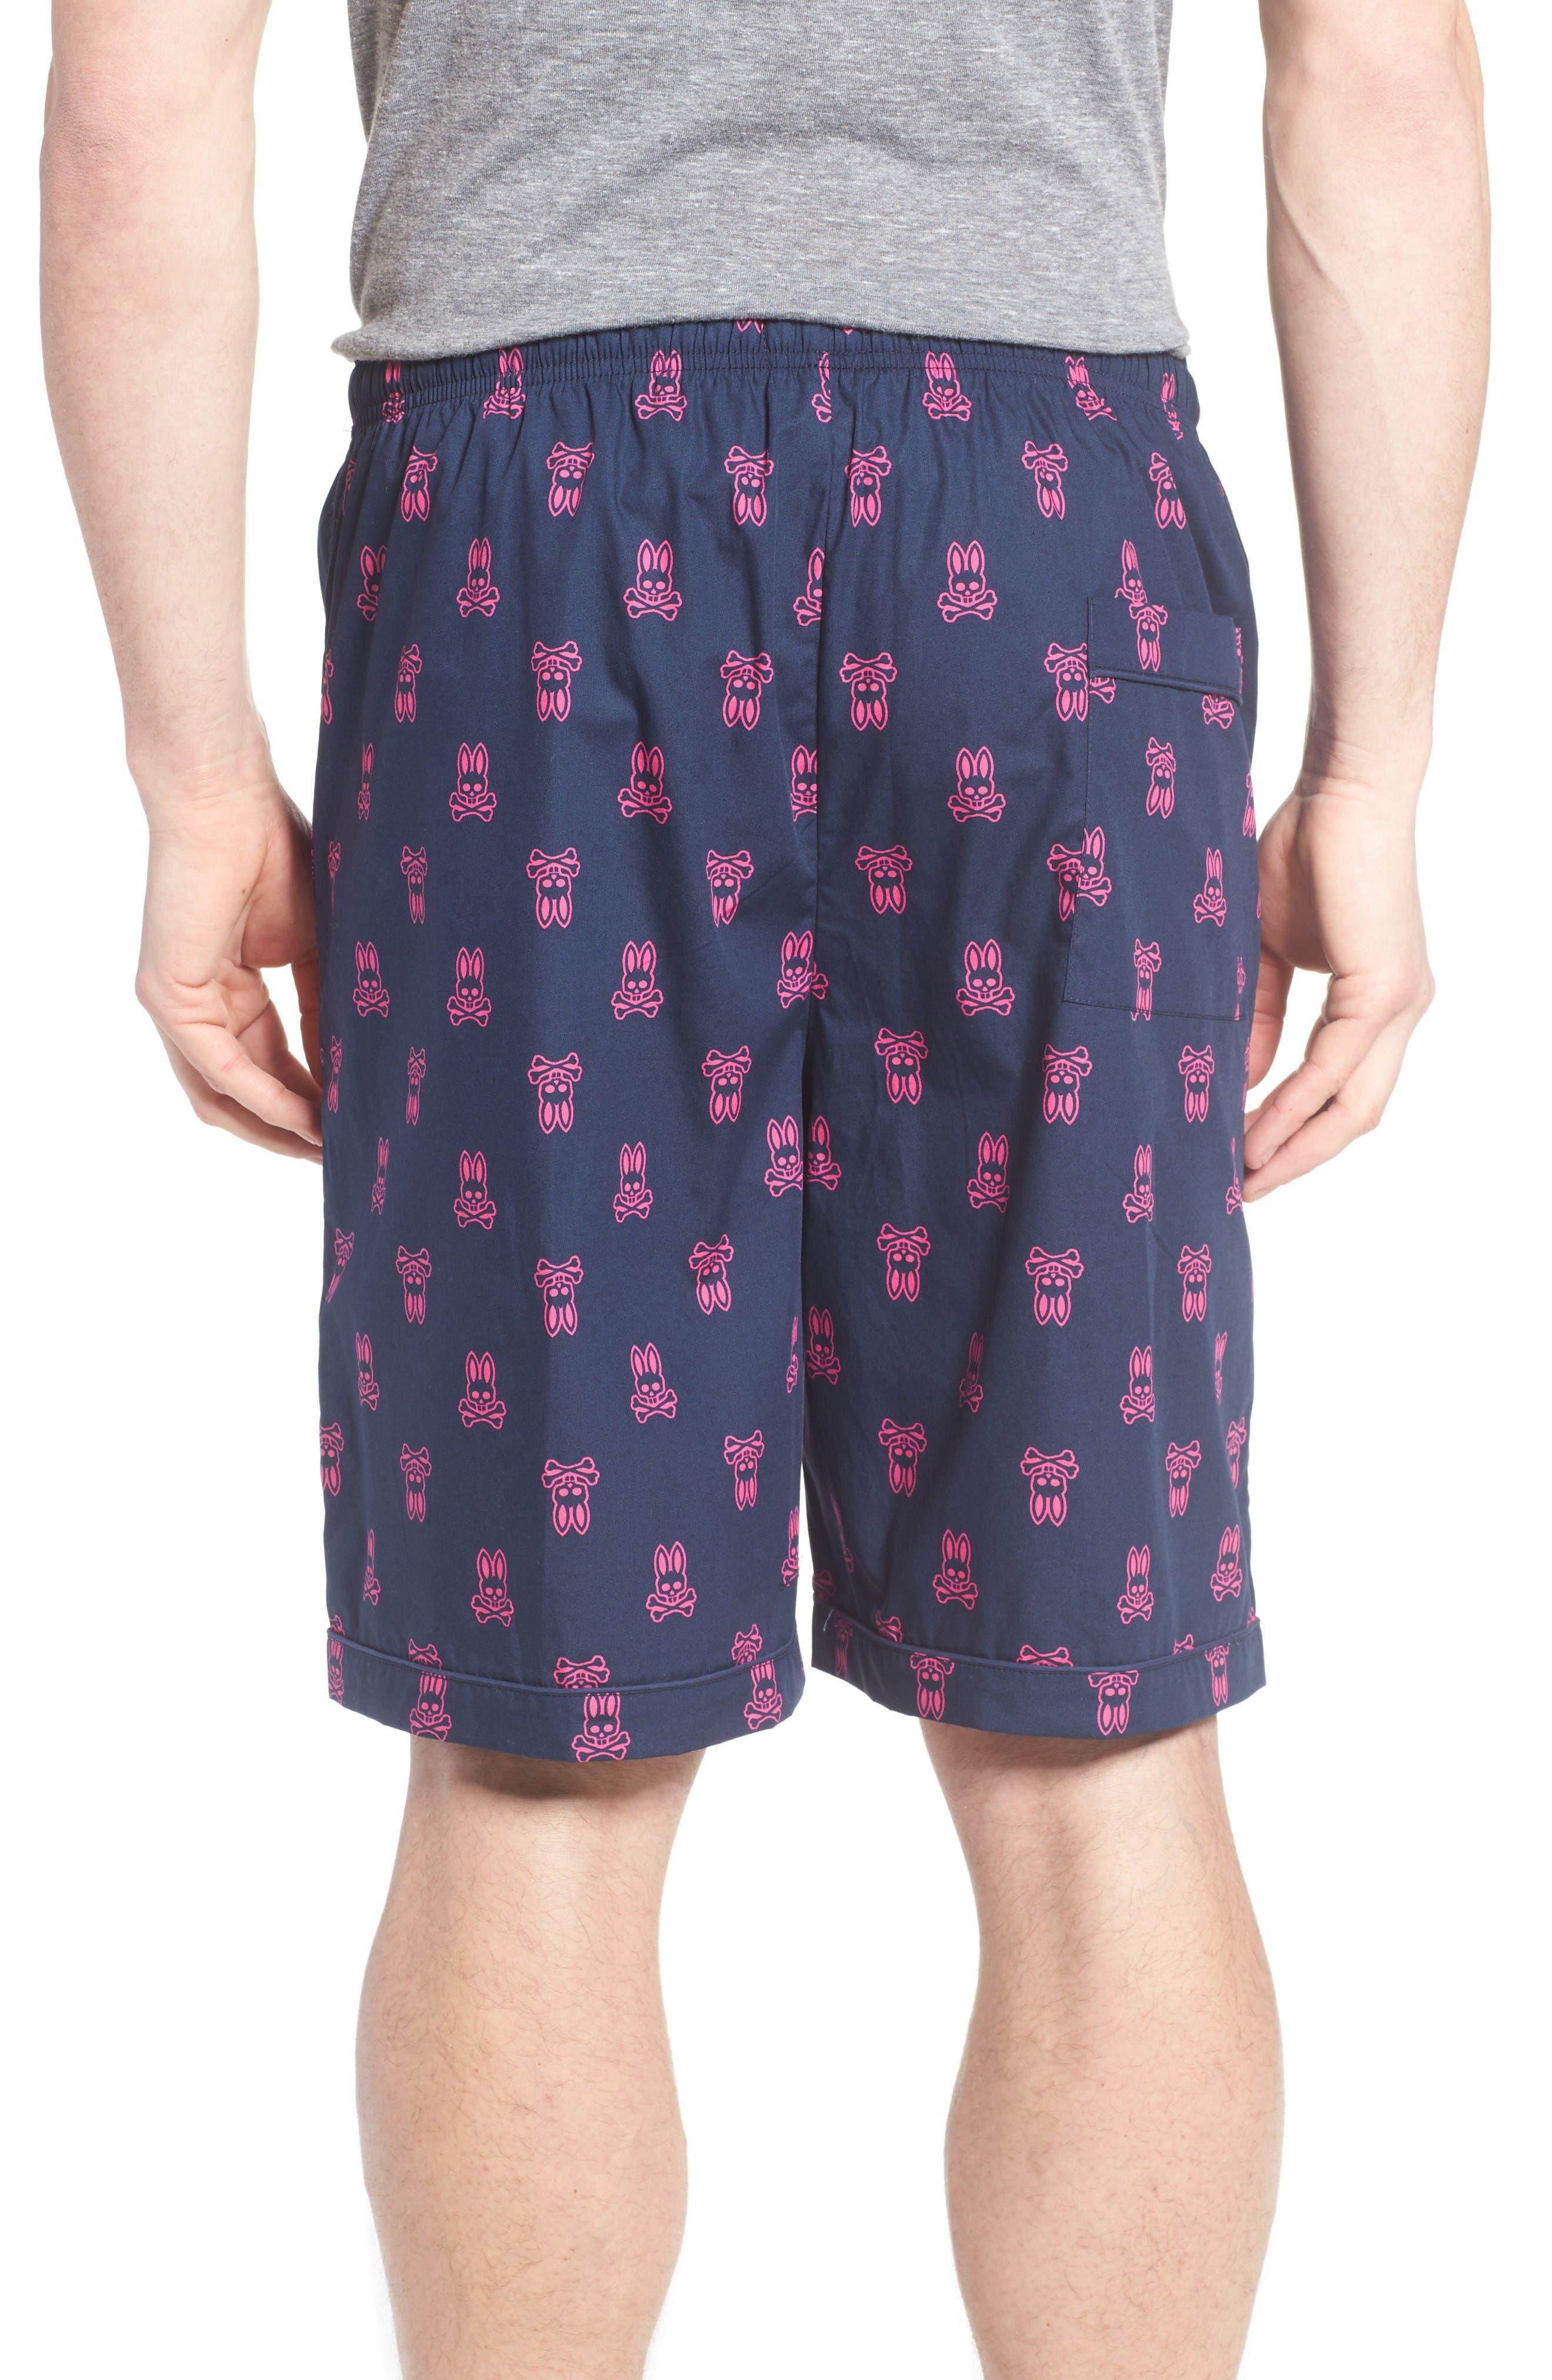 Cotton Lounge Shorts,                             Alternate thumbnail 2, color,                             Peacoat Bunny